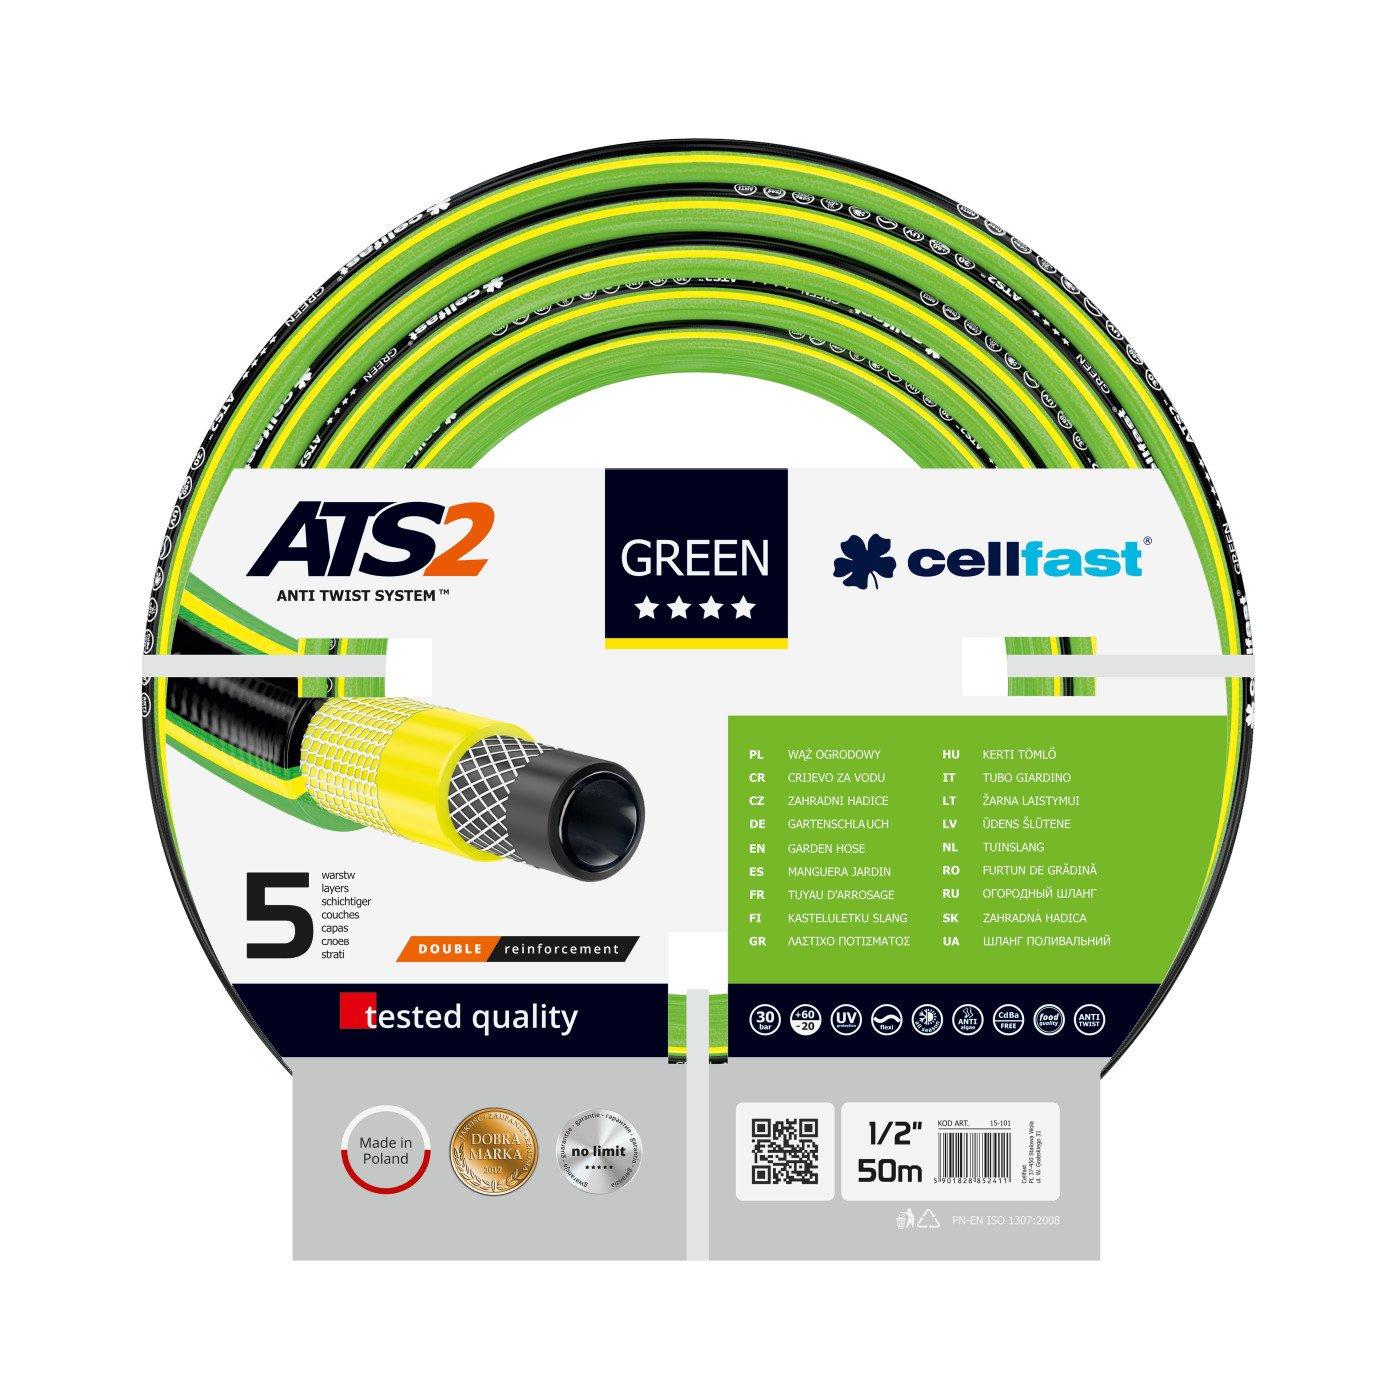 CELLFAST - TUINSLANG - GREEN ATS2™ 1/2